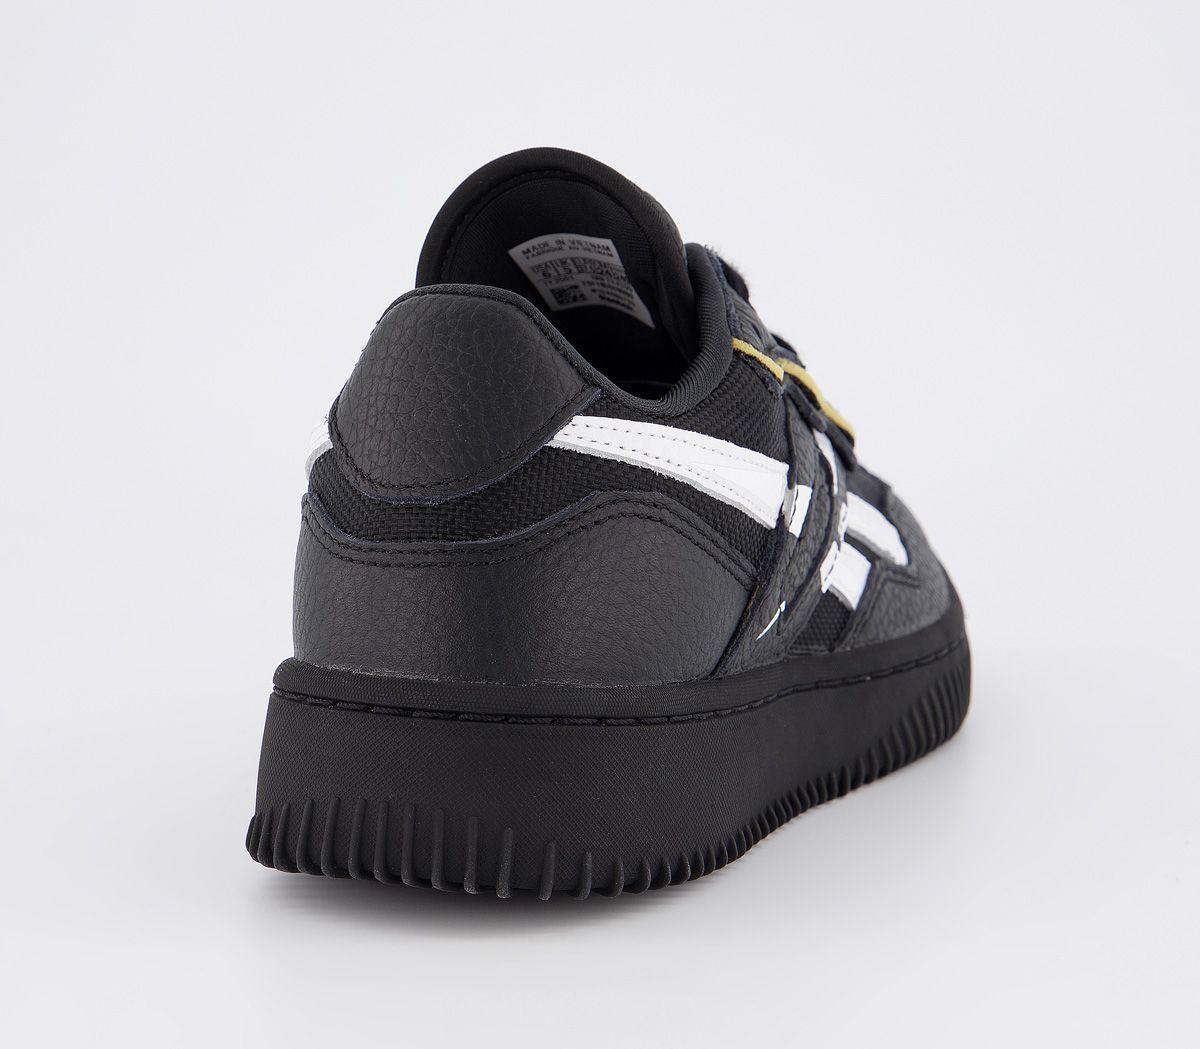 Womens Reebok Dual Court Ii Trainers Victoria Beckham Black White Trainers Shoes